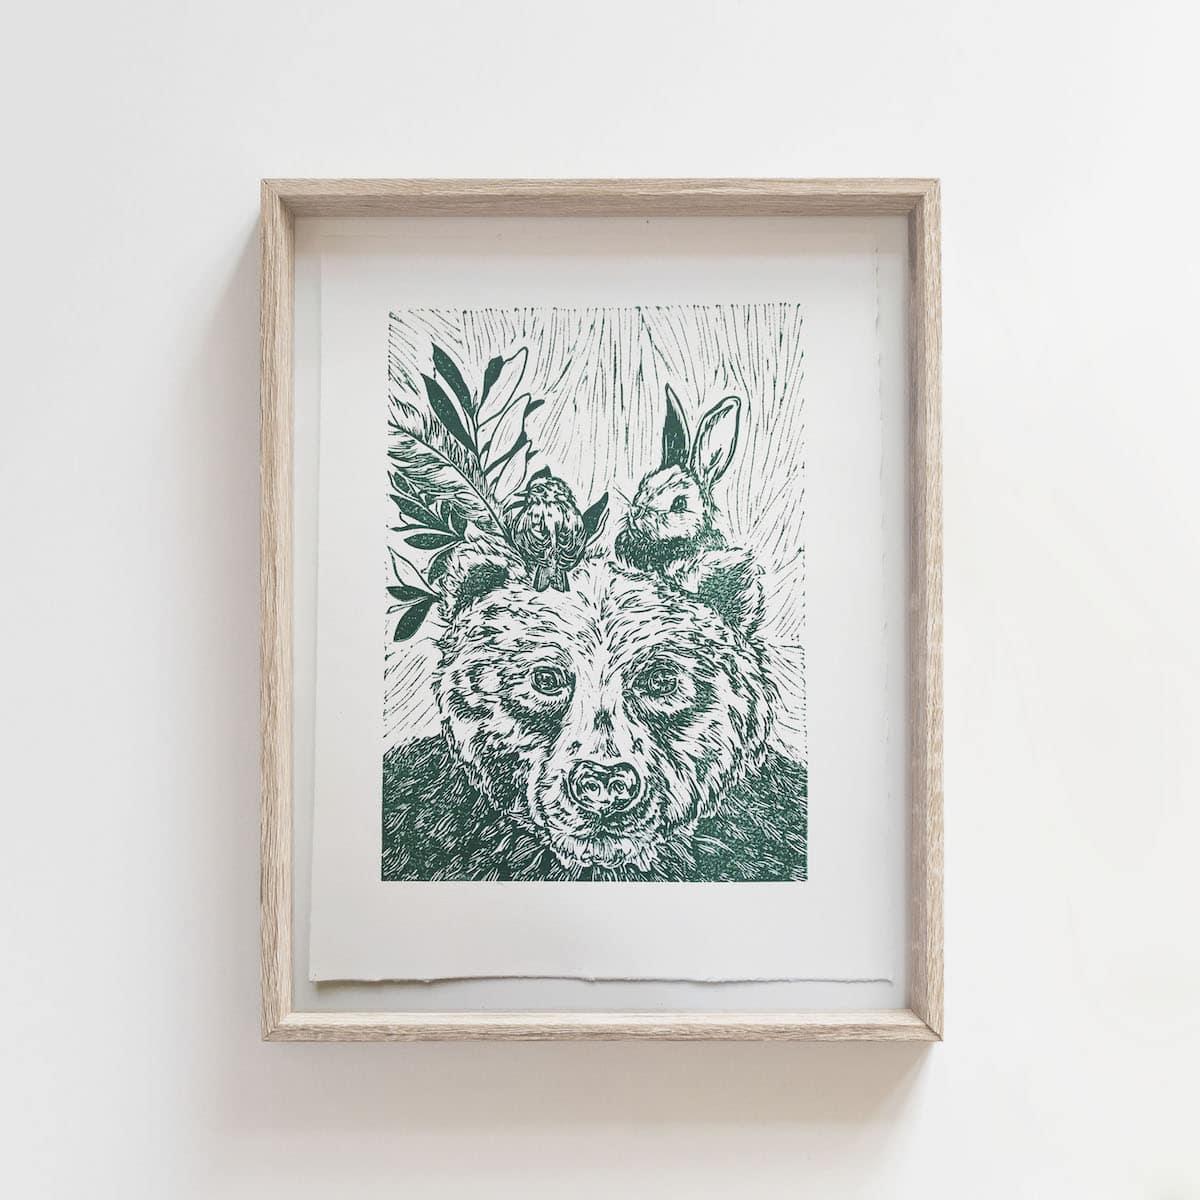 (Linoprint) The Perfect Trio – By Jocelin Meredith Artwork